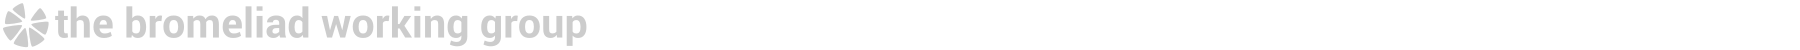 Bromeliad Working Group Wiki